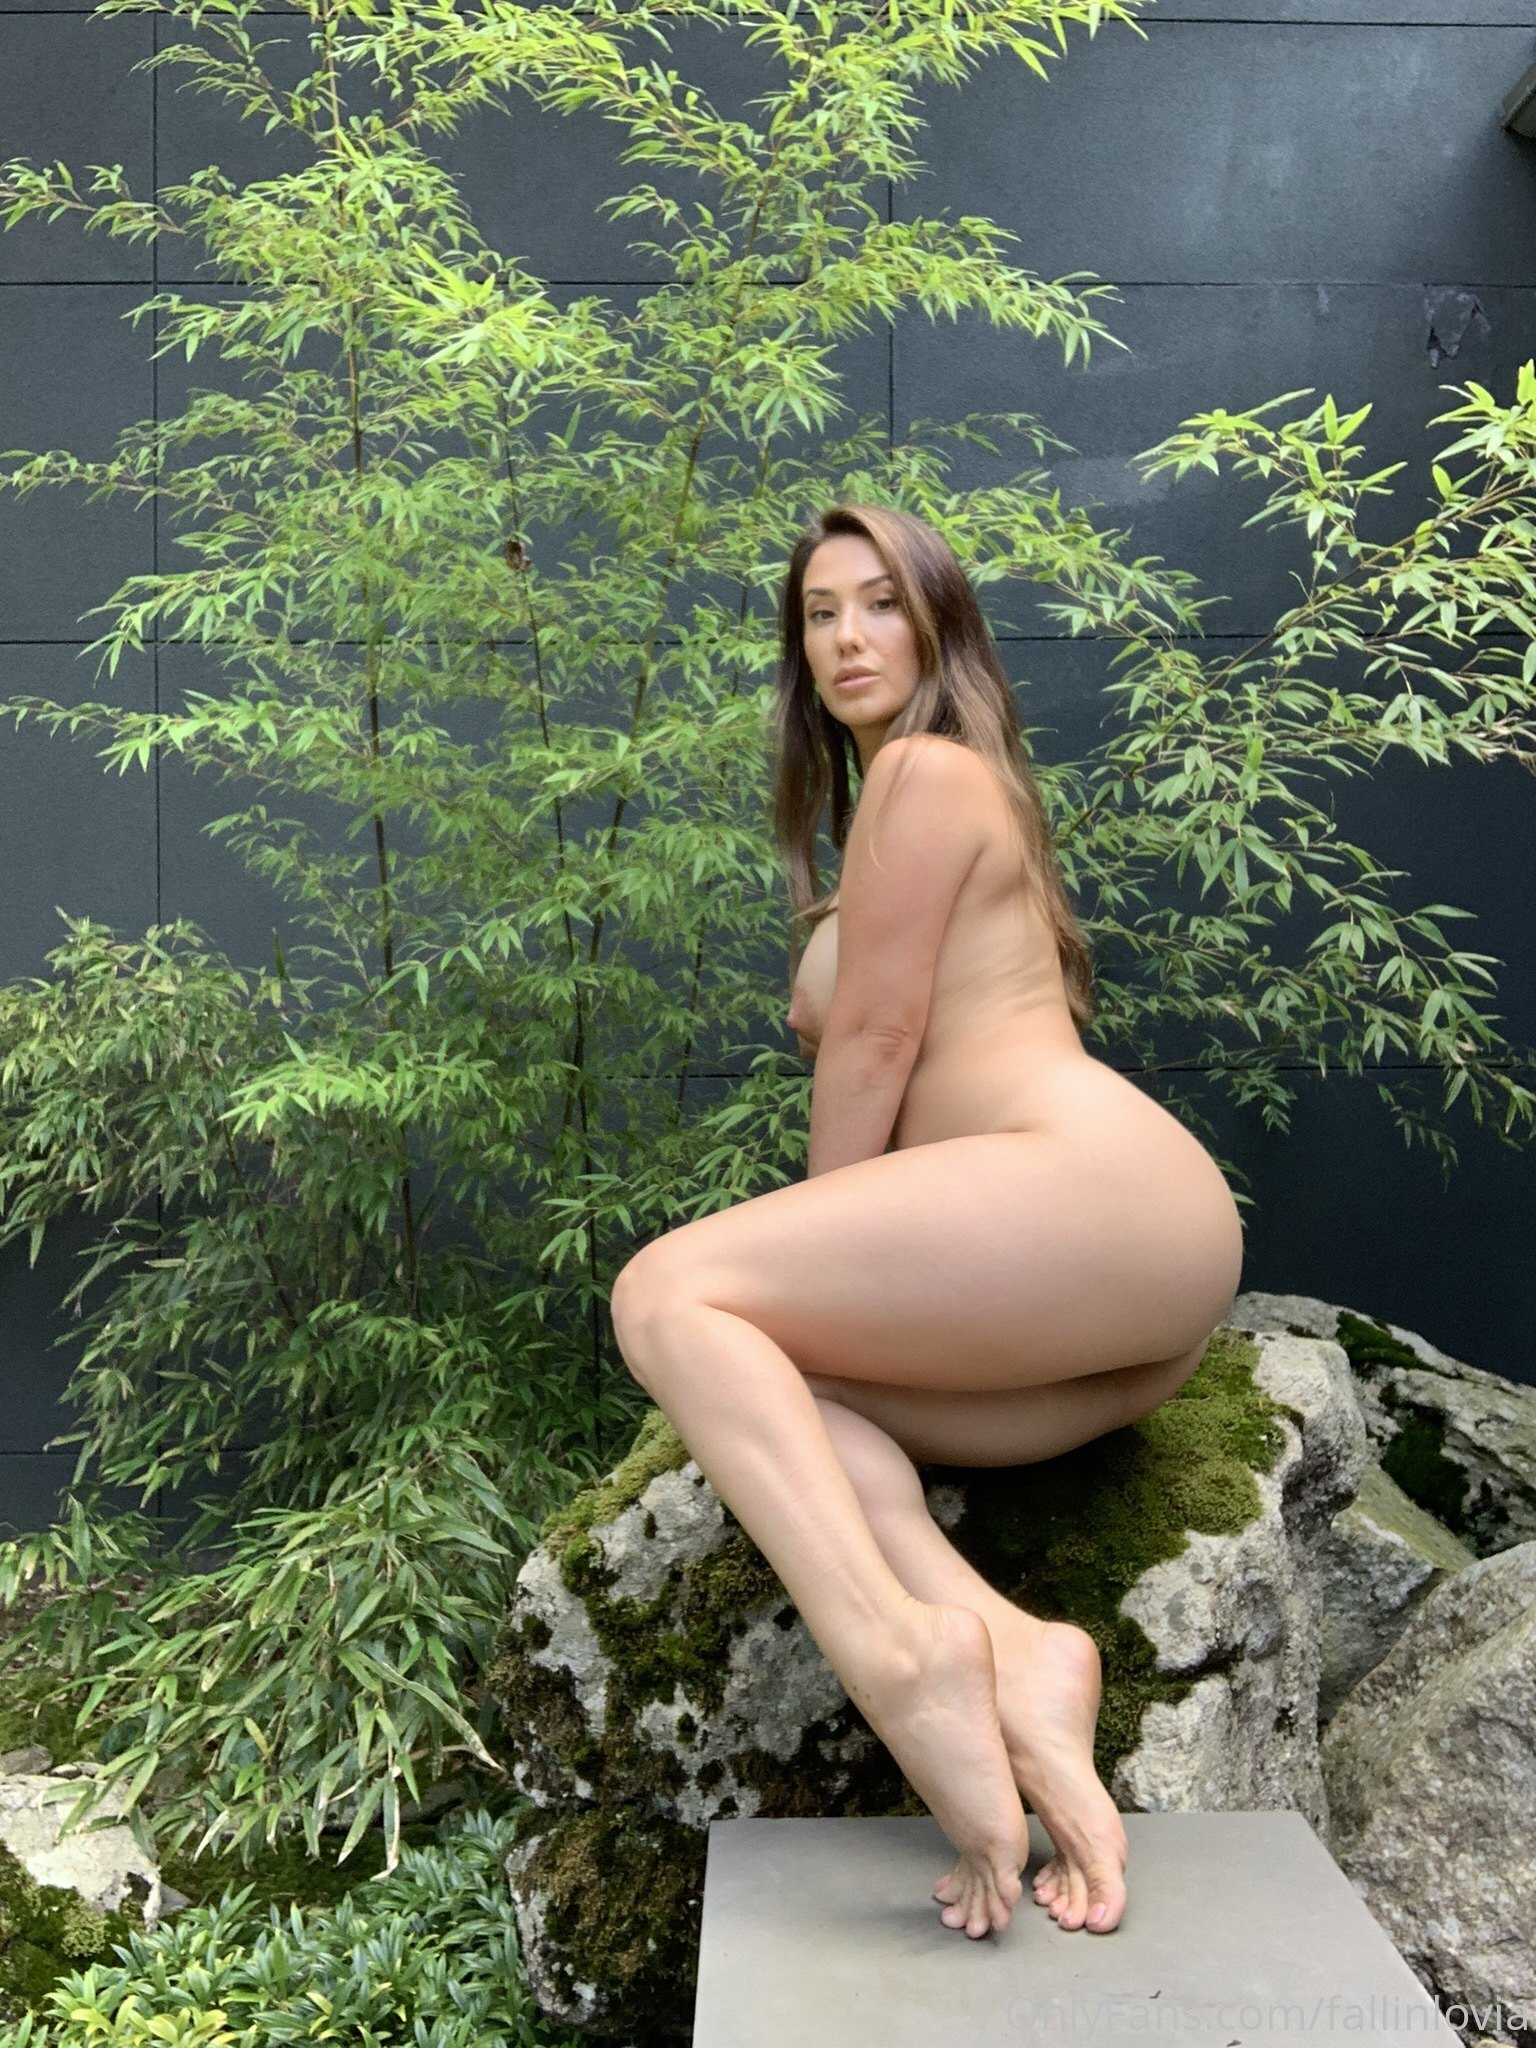 Eva Lovia, Fallinlovia, Onlyfans 0252